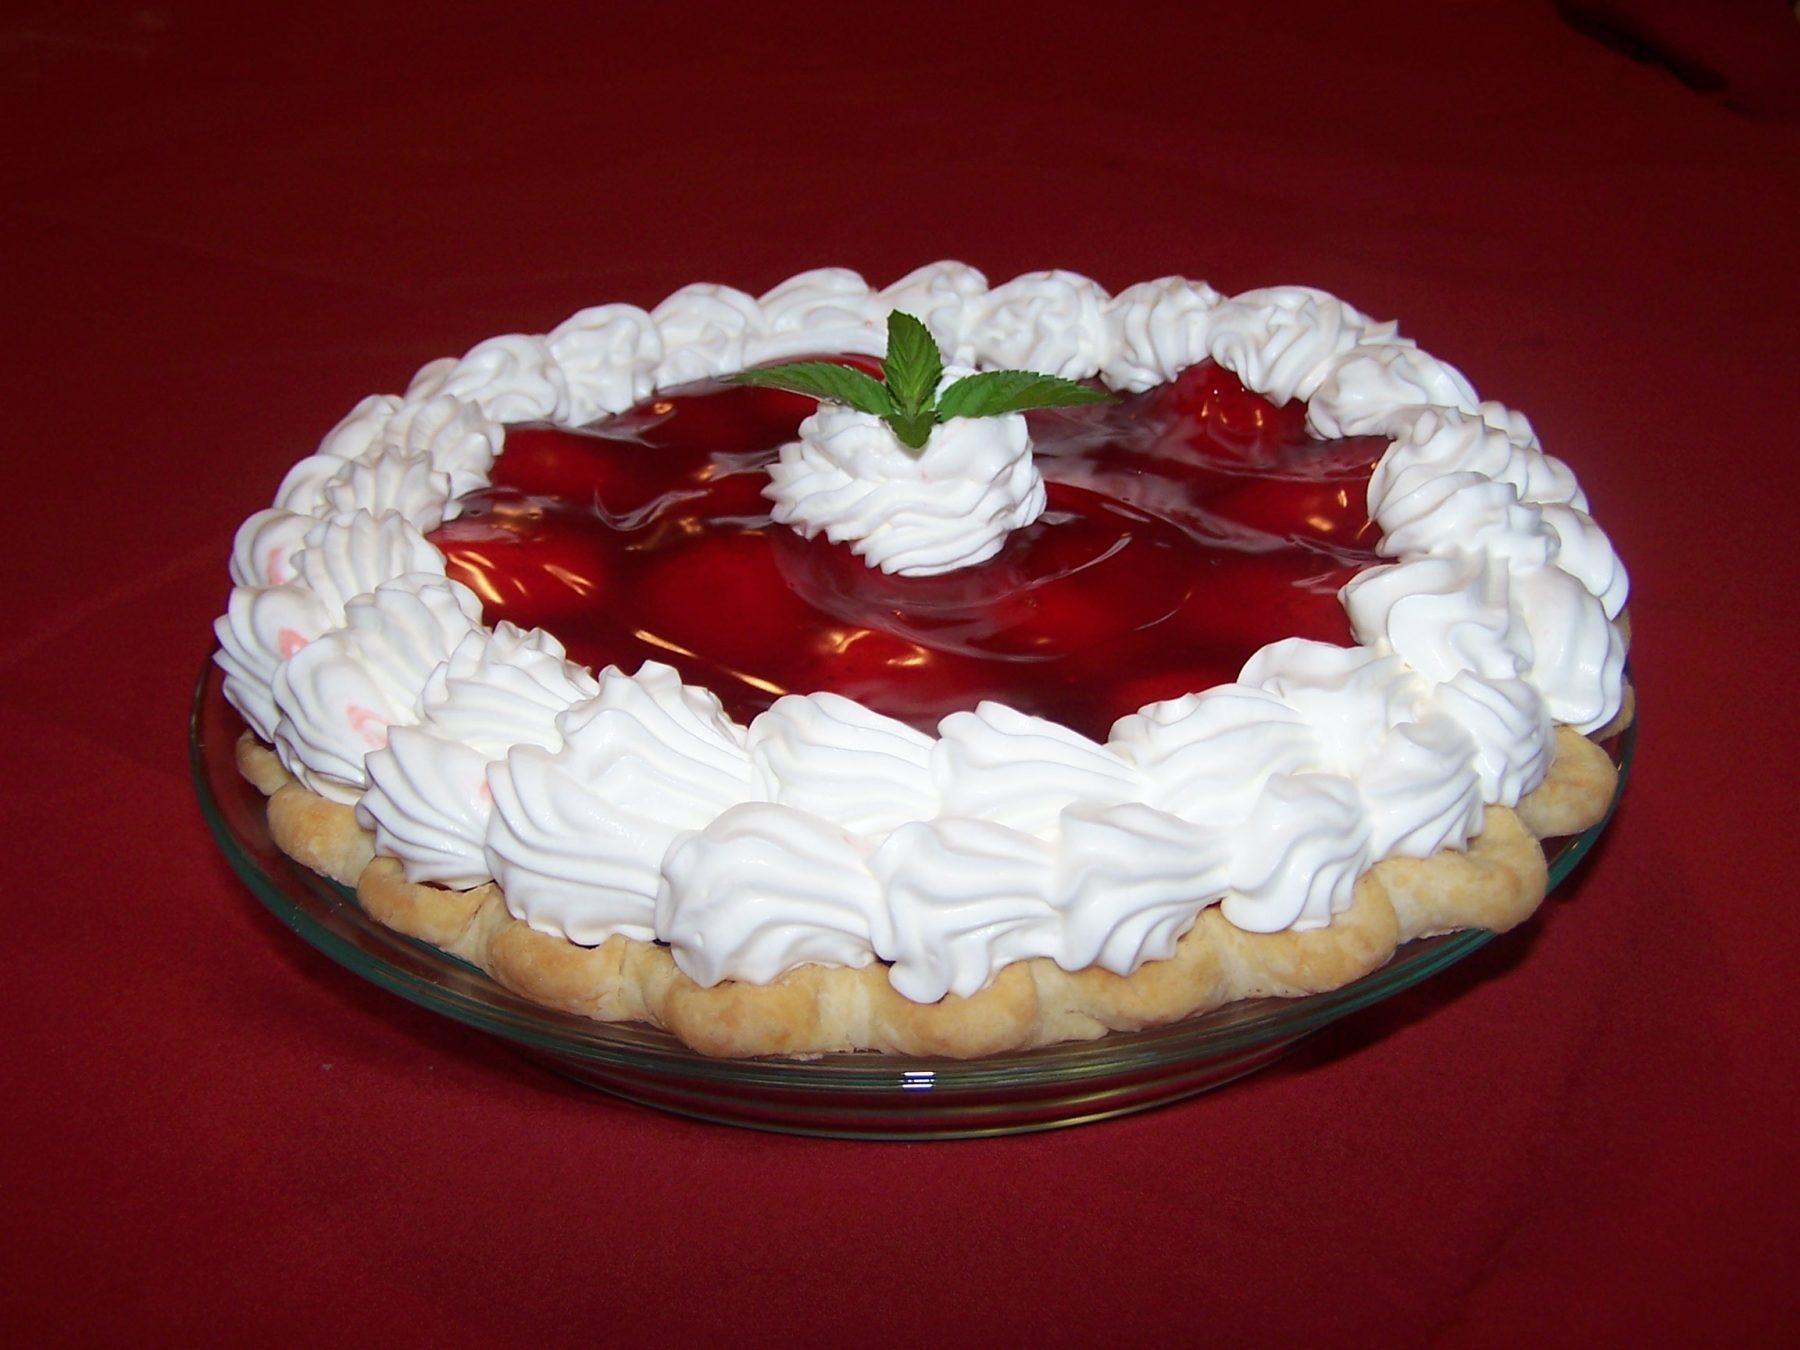 pie with cream side 2 - Copy